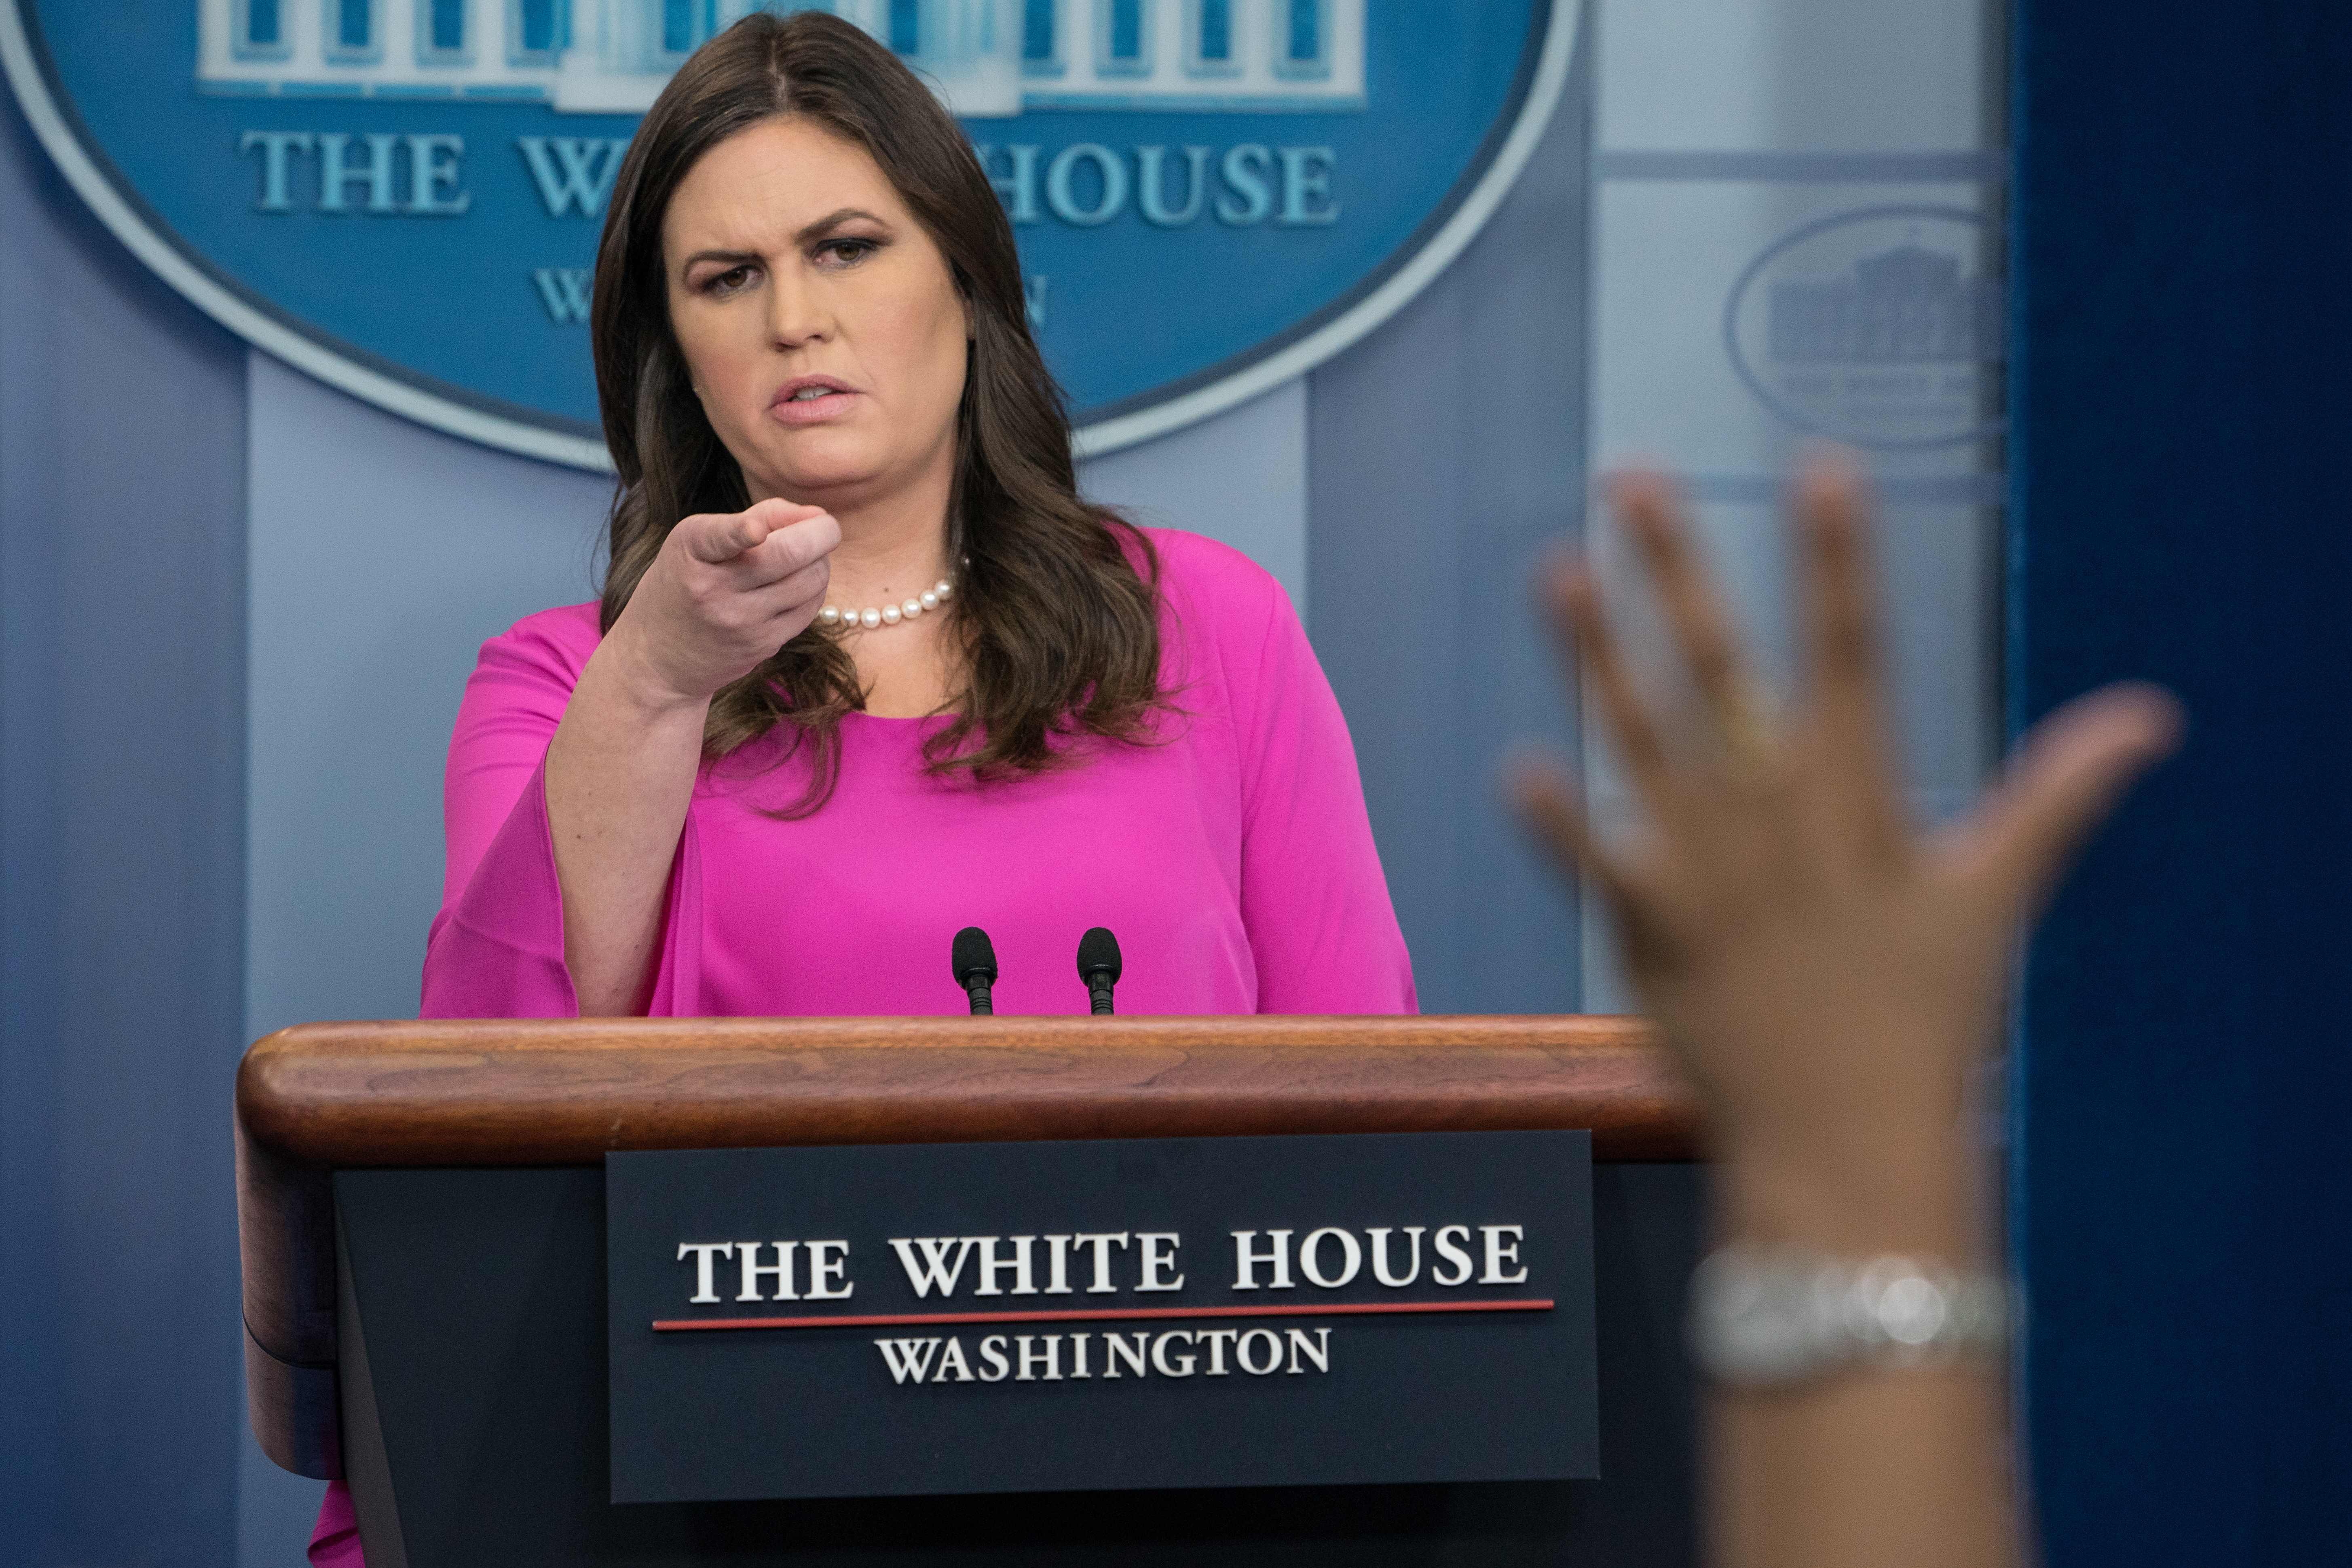 5d5663b946ed Watch: White House press briefing live stream after Paul Manafort, Rick  Gates FBI indictments - CBS News